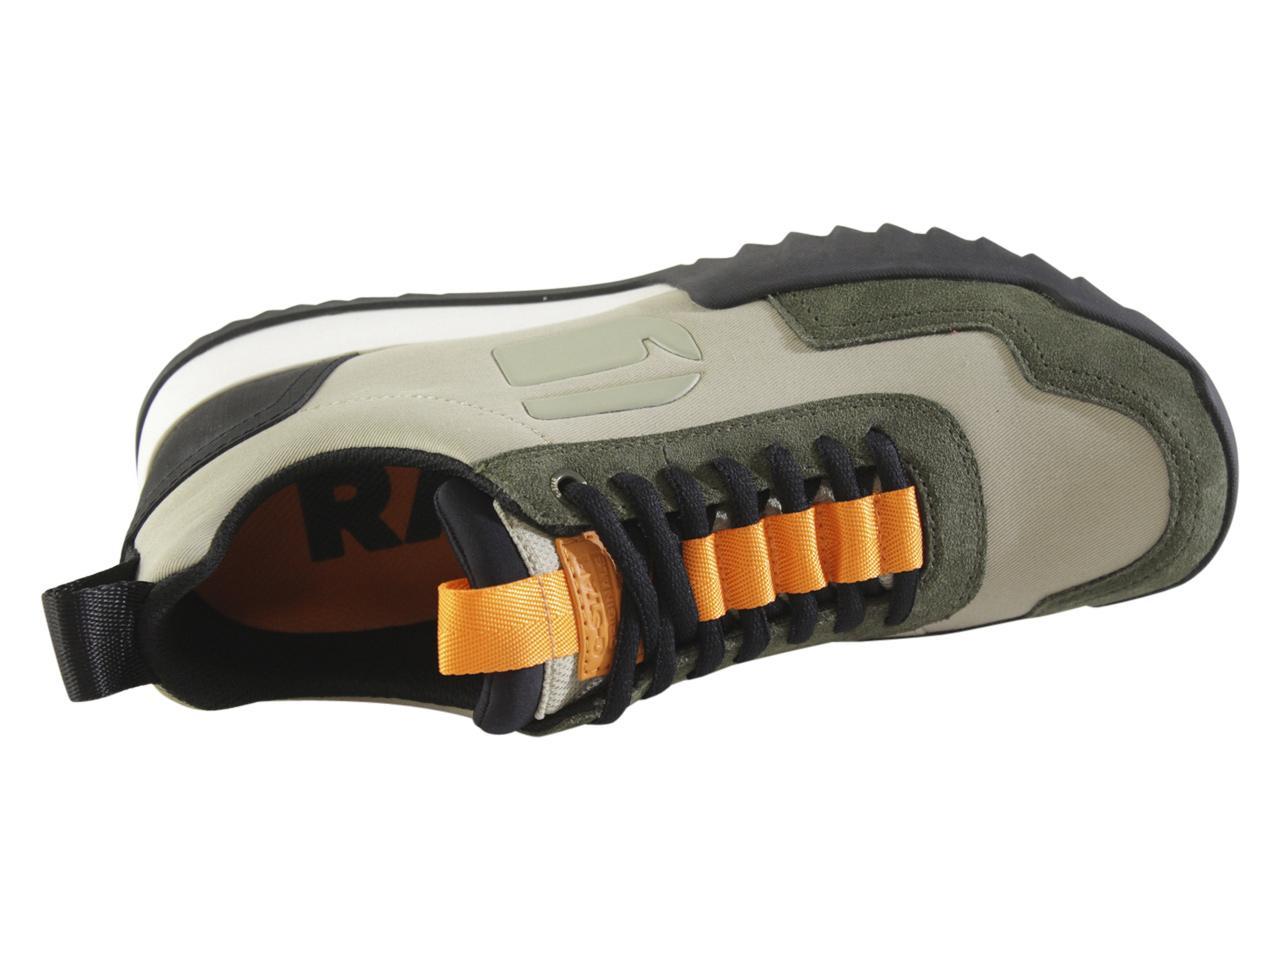 G Raw Men's Sneakers Shoes Star Rackam Rovic L3qRj4A5